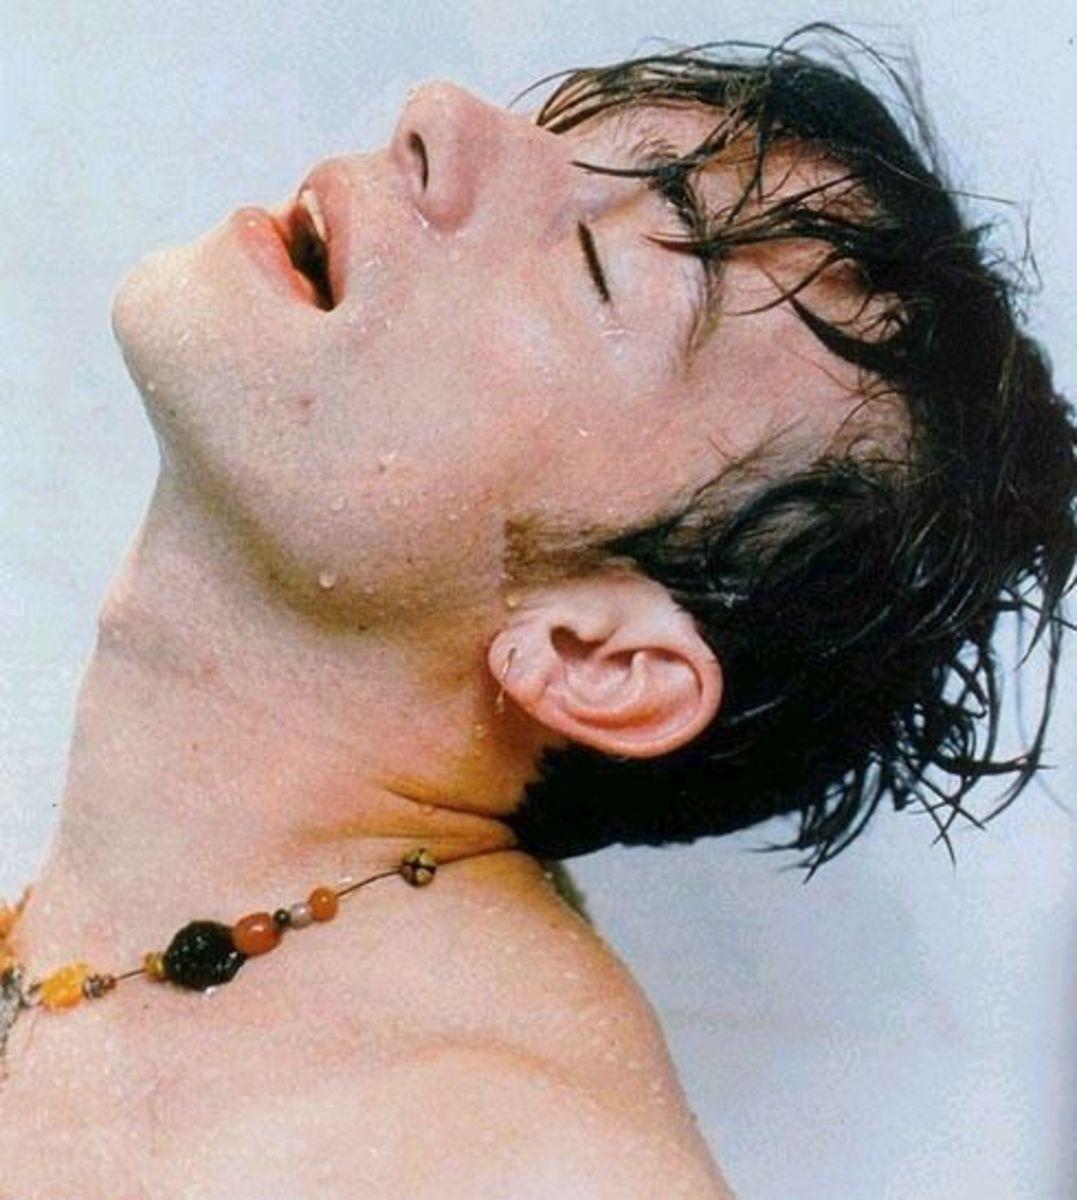 Damon Albarn- quite the hottie, eh?